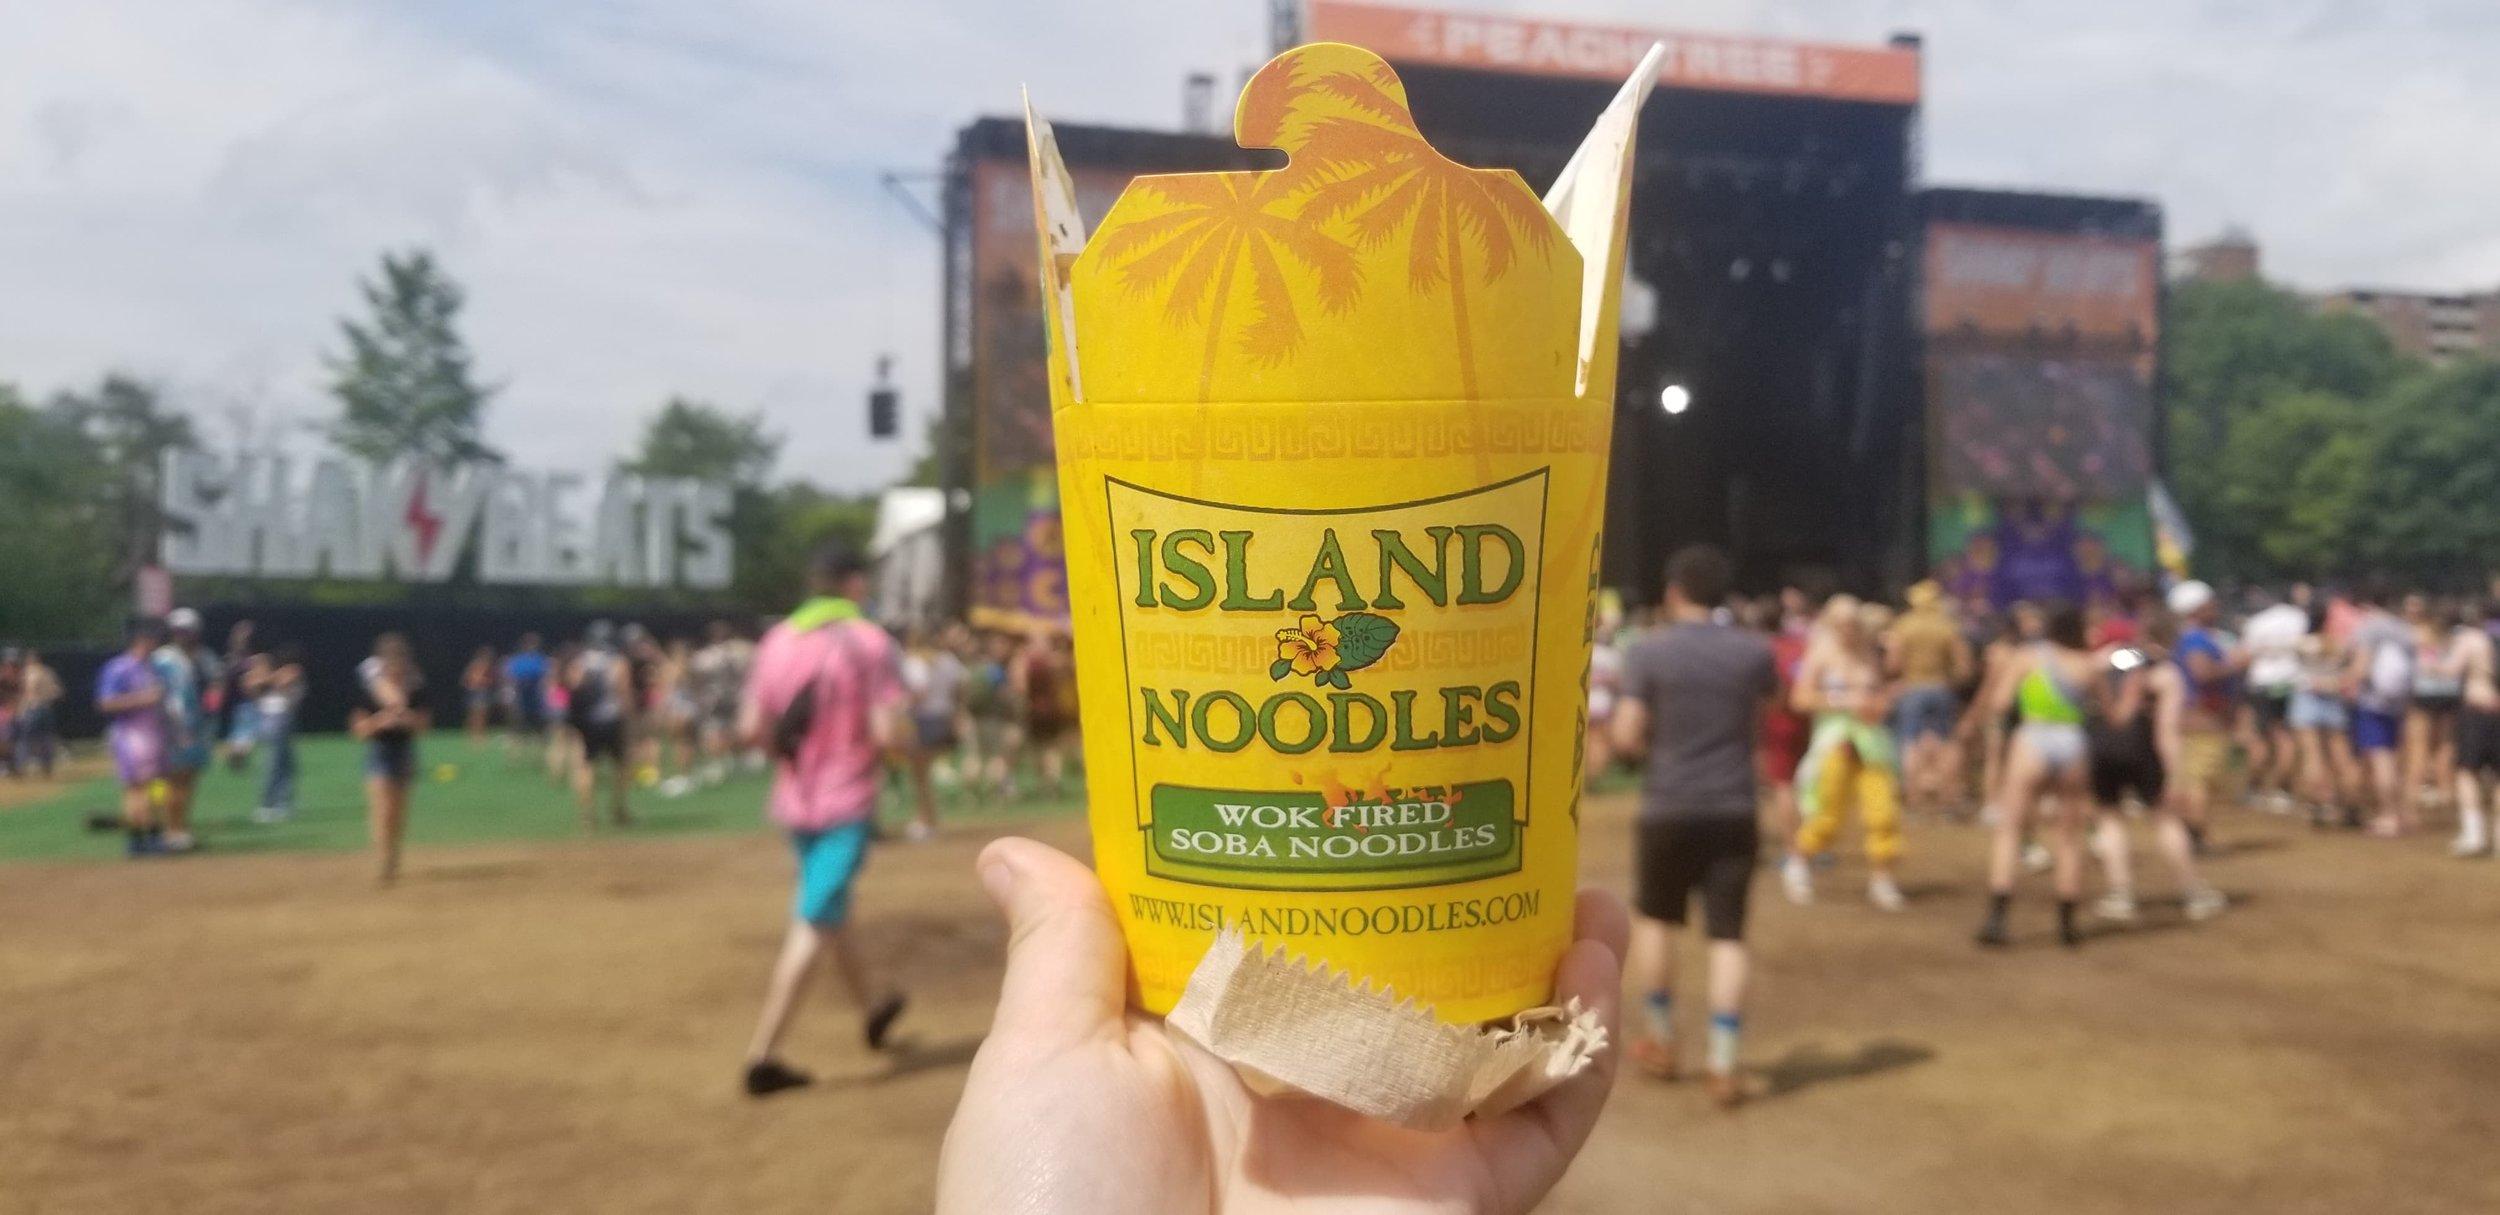 Island Noodles at Shaky Beats Music Festival 2019